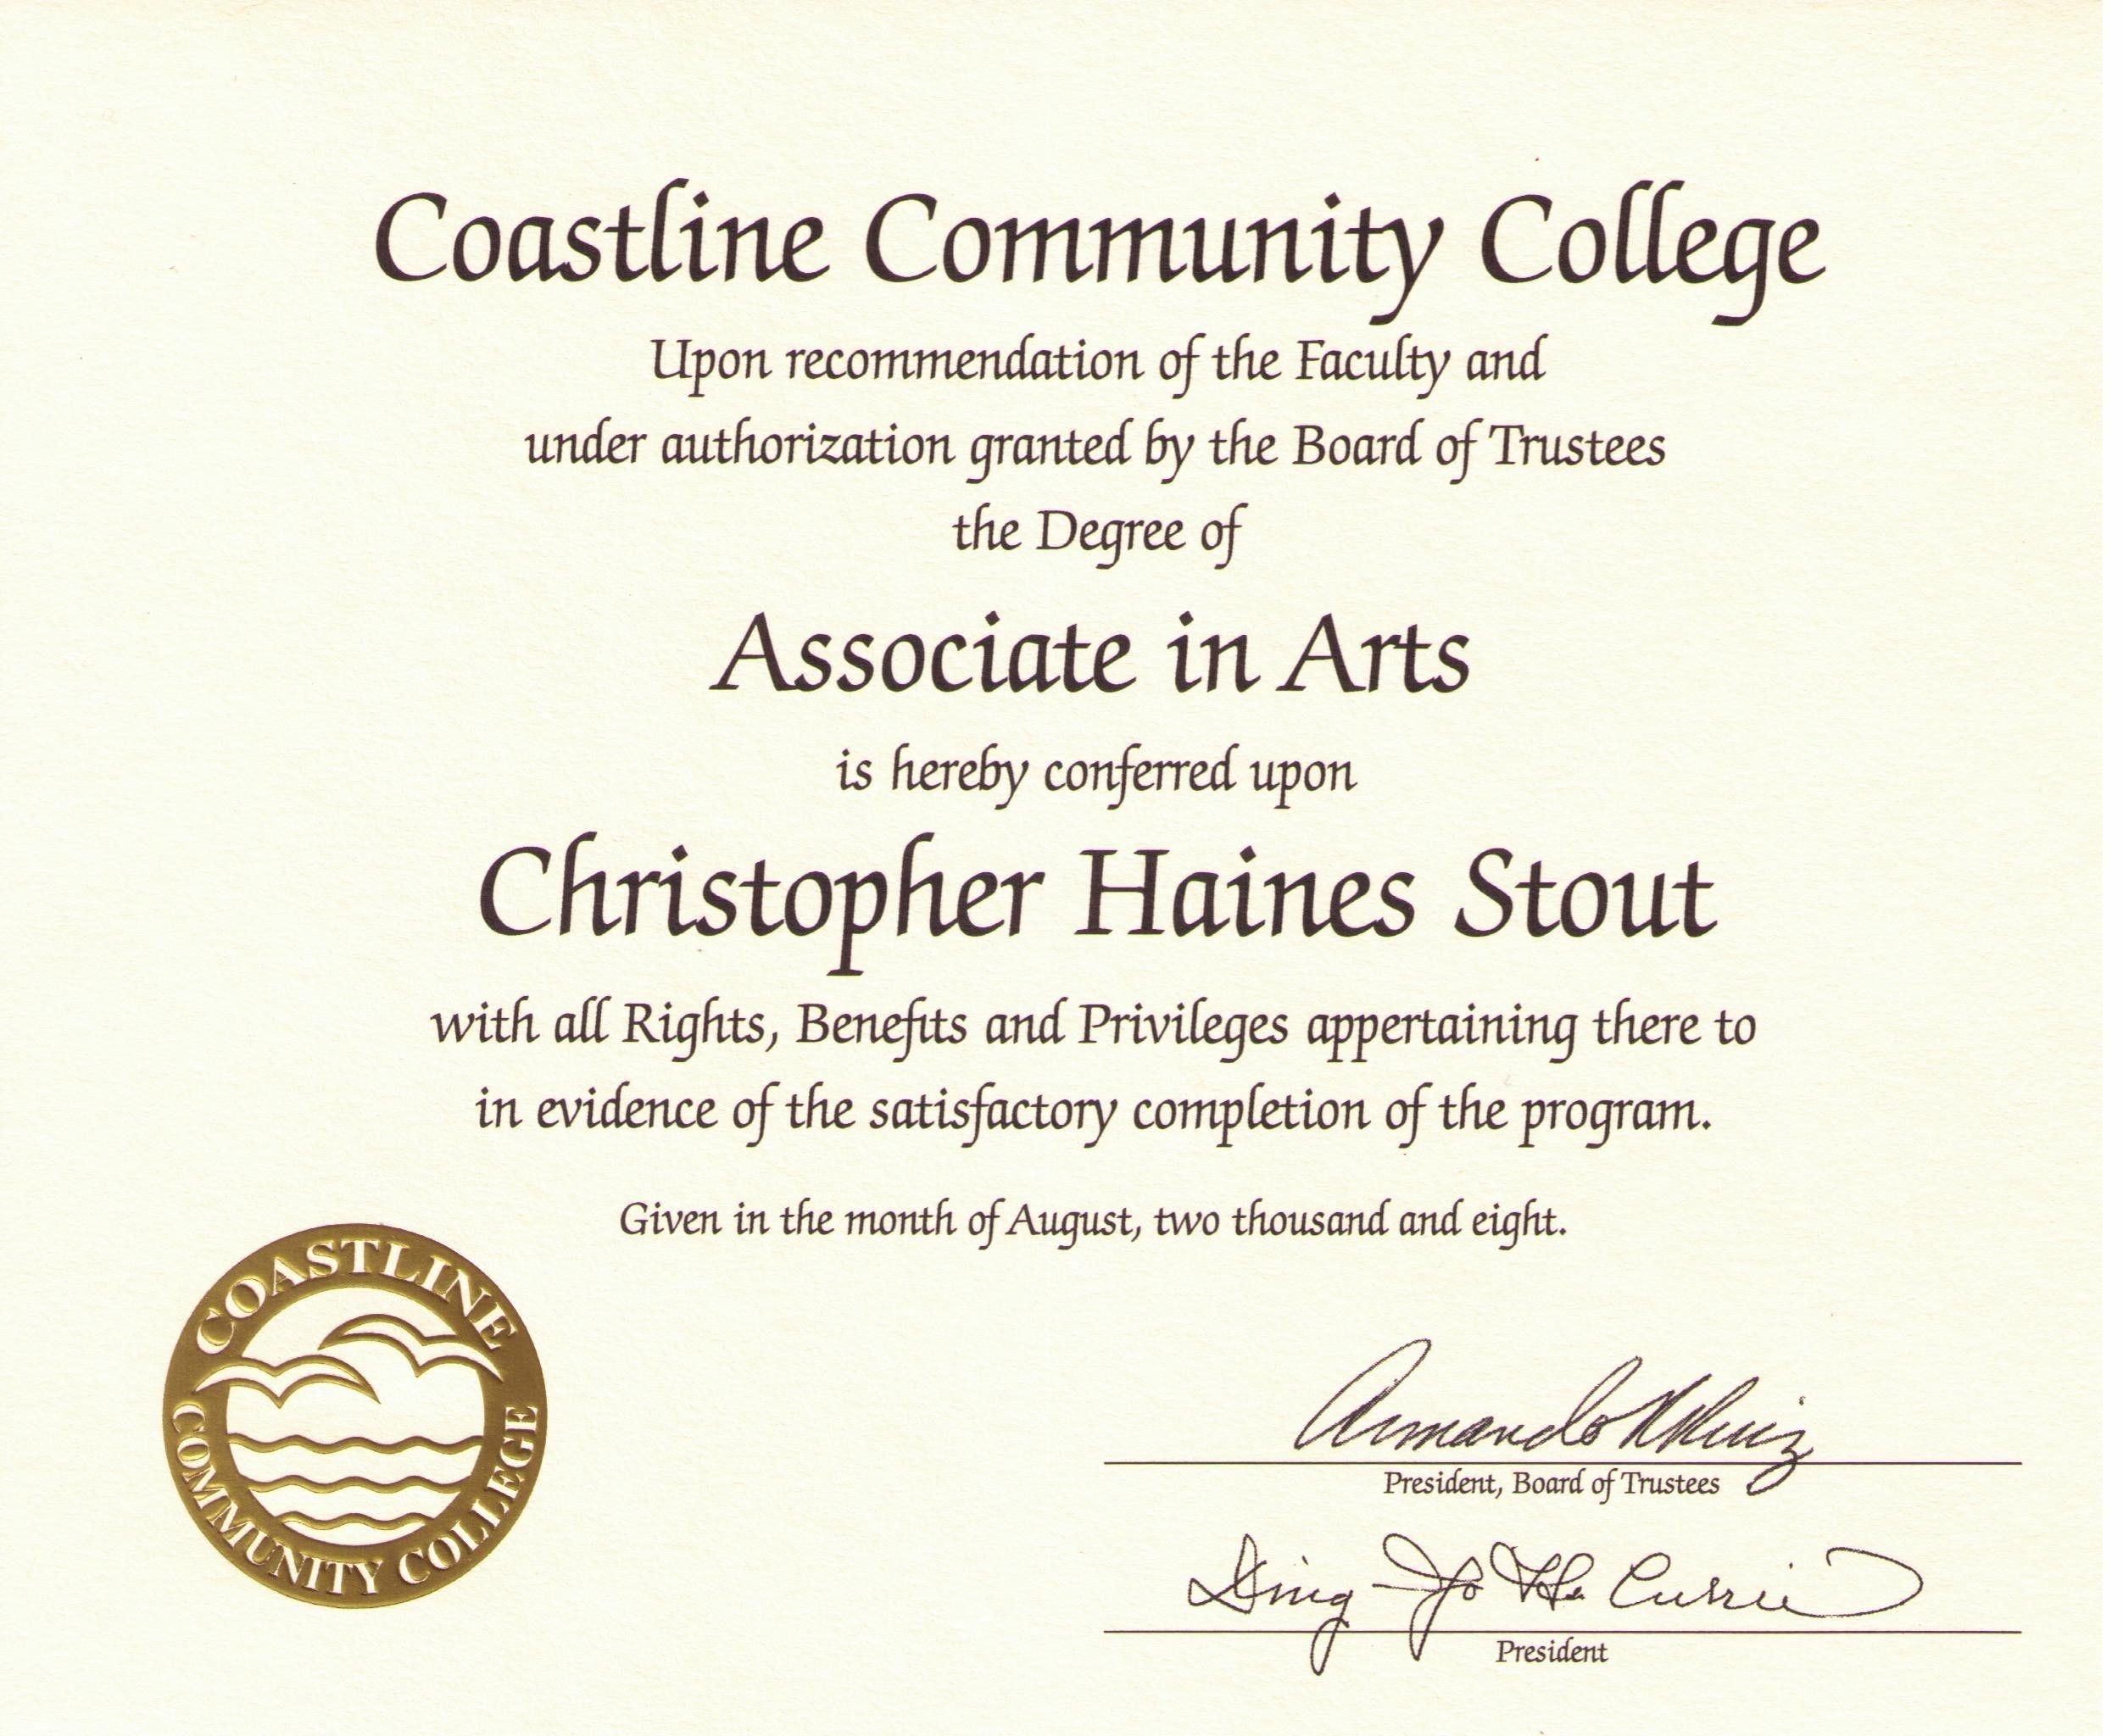 Free Printable College Diploma | Free Diploma Templates | In1 - Free Printable High School Diploma Templates